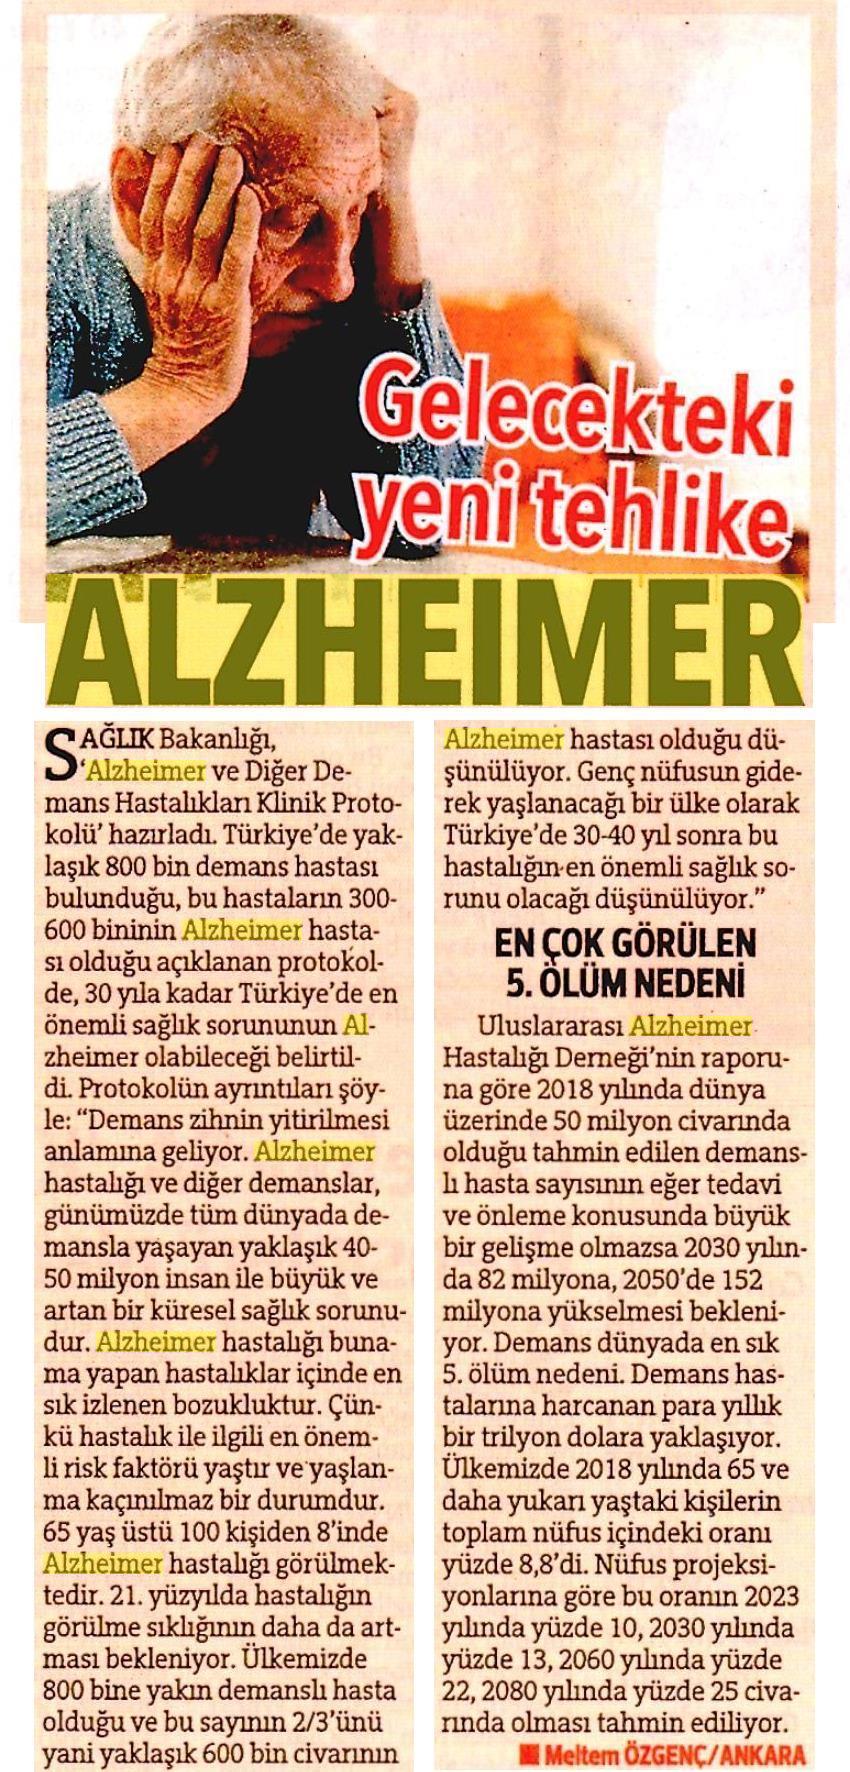 Gelecekteki Yeni Tehlike Alzheimer